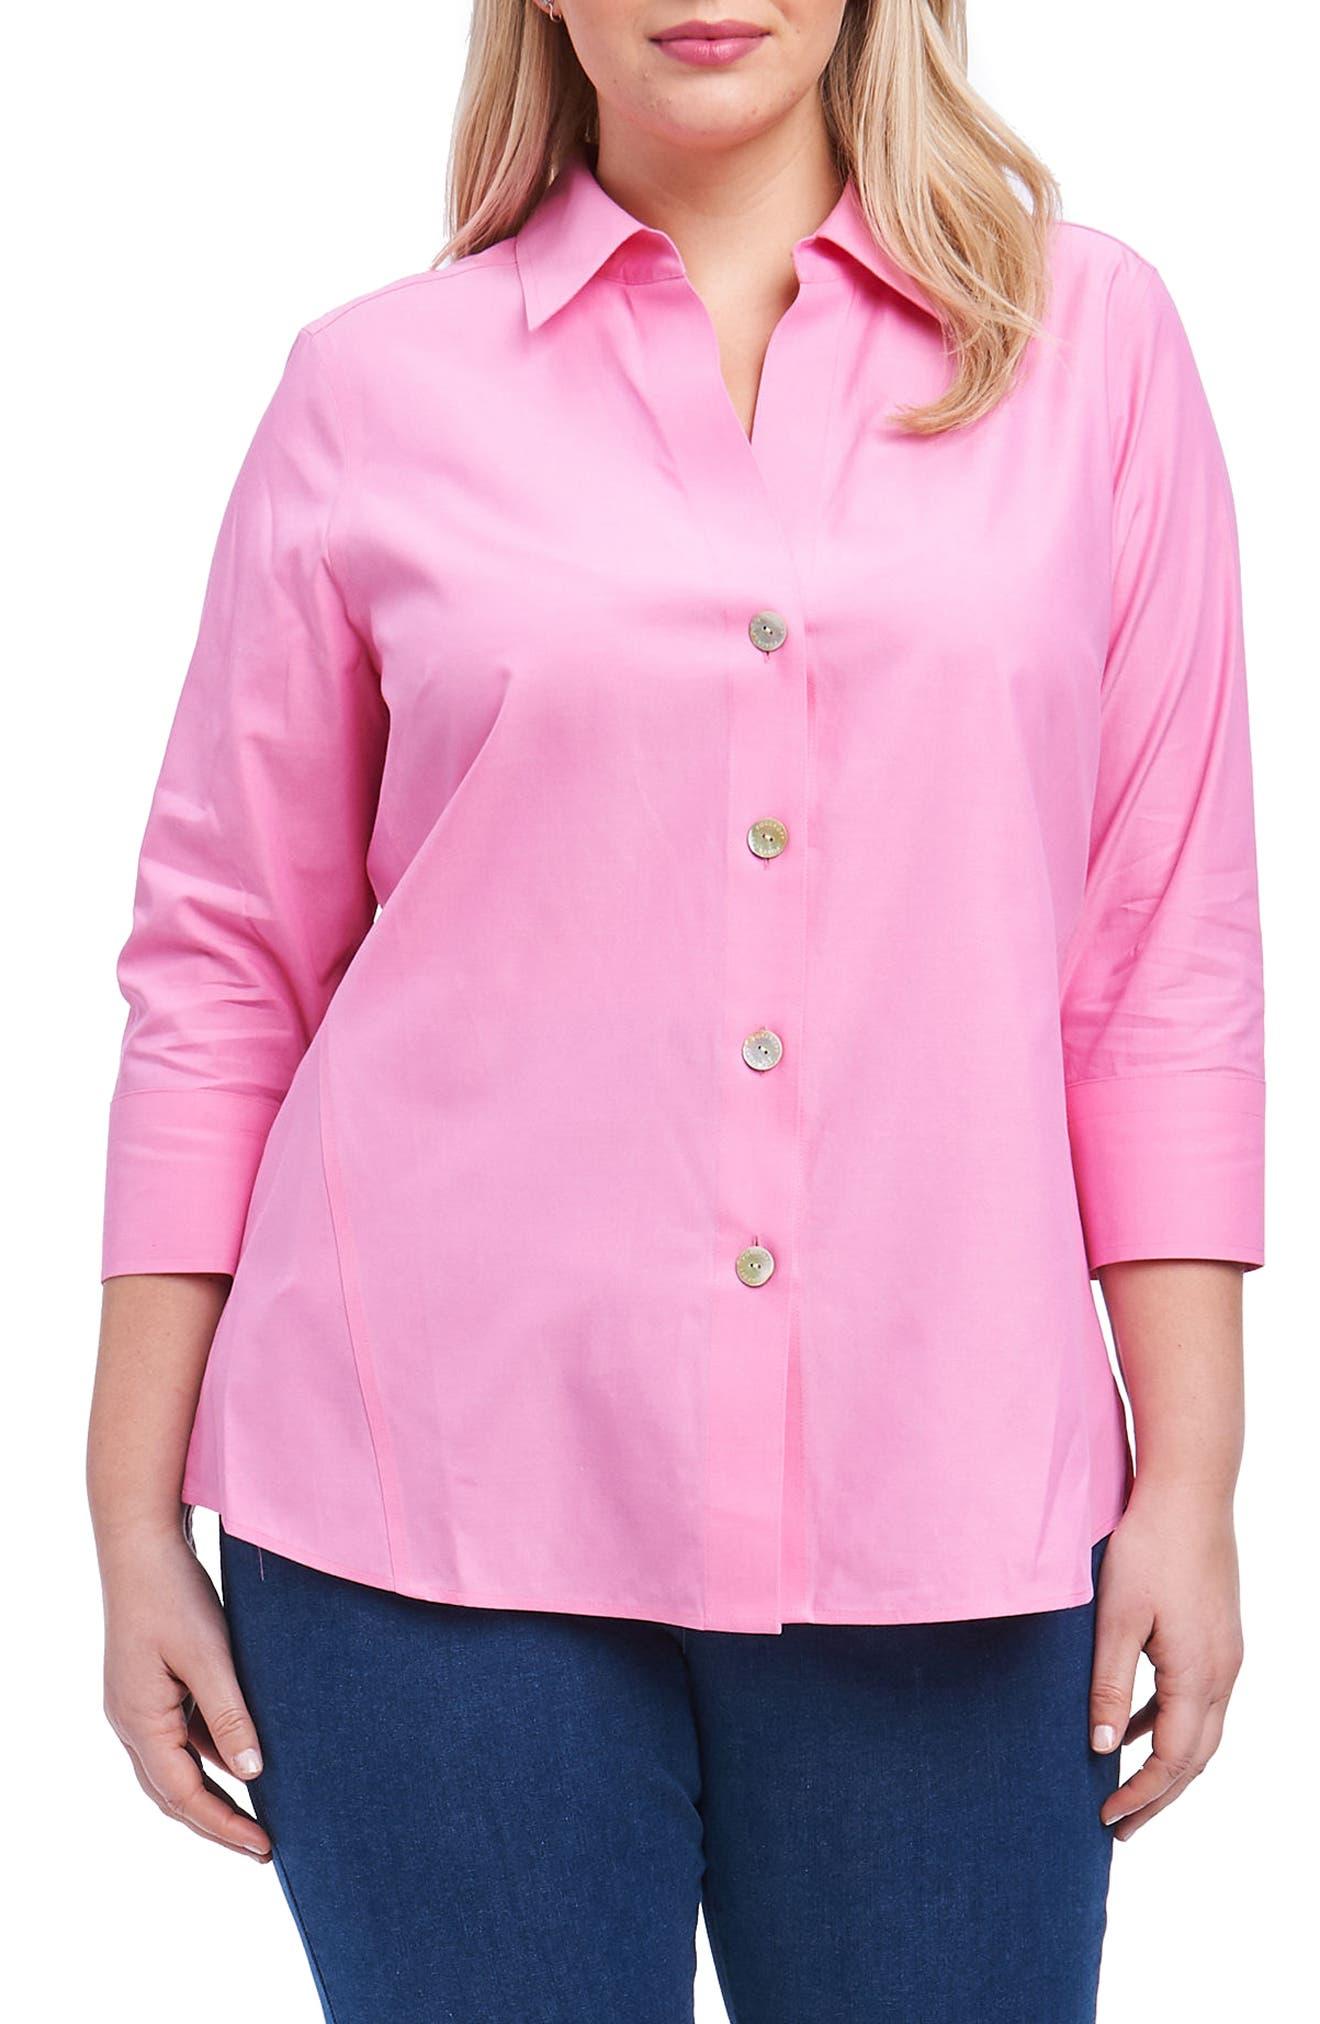 Main Image - Foxcroft 'Paige' Non-Iron Cotton Shirt (Plus Size)